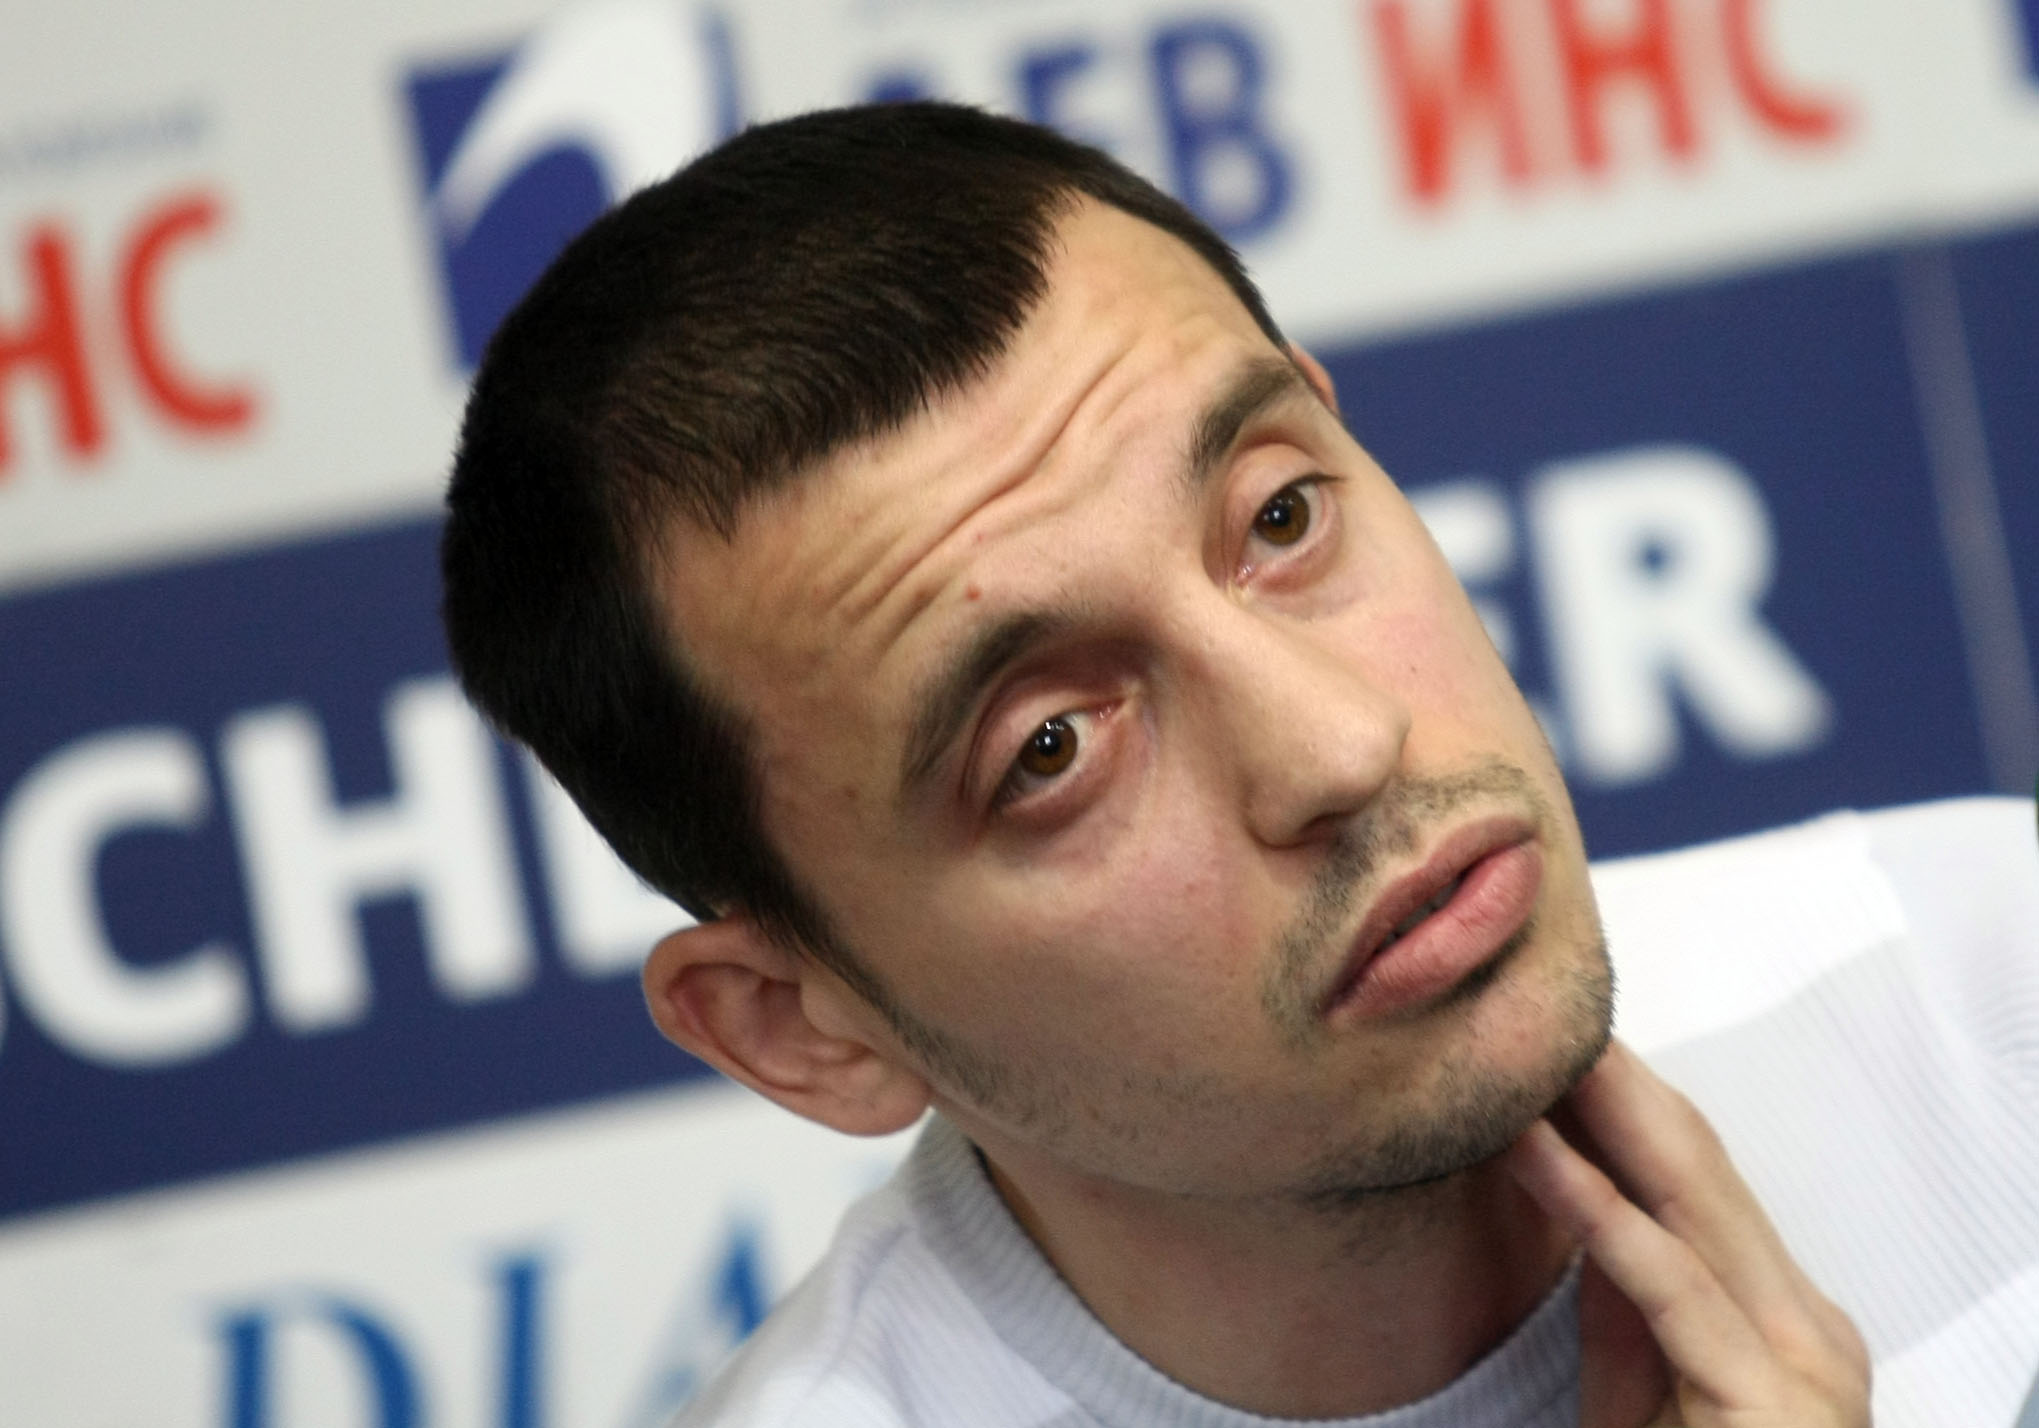 Далаклиев: Контролният кантар показа 56 килограма и ни подведе